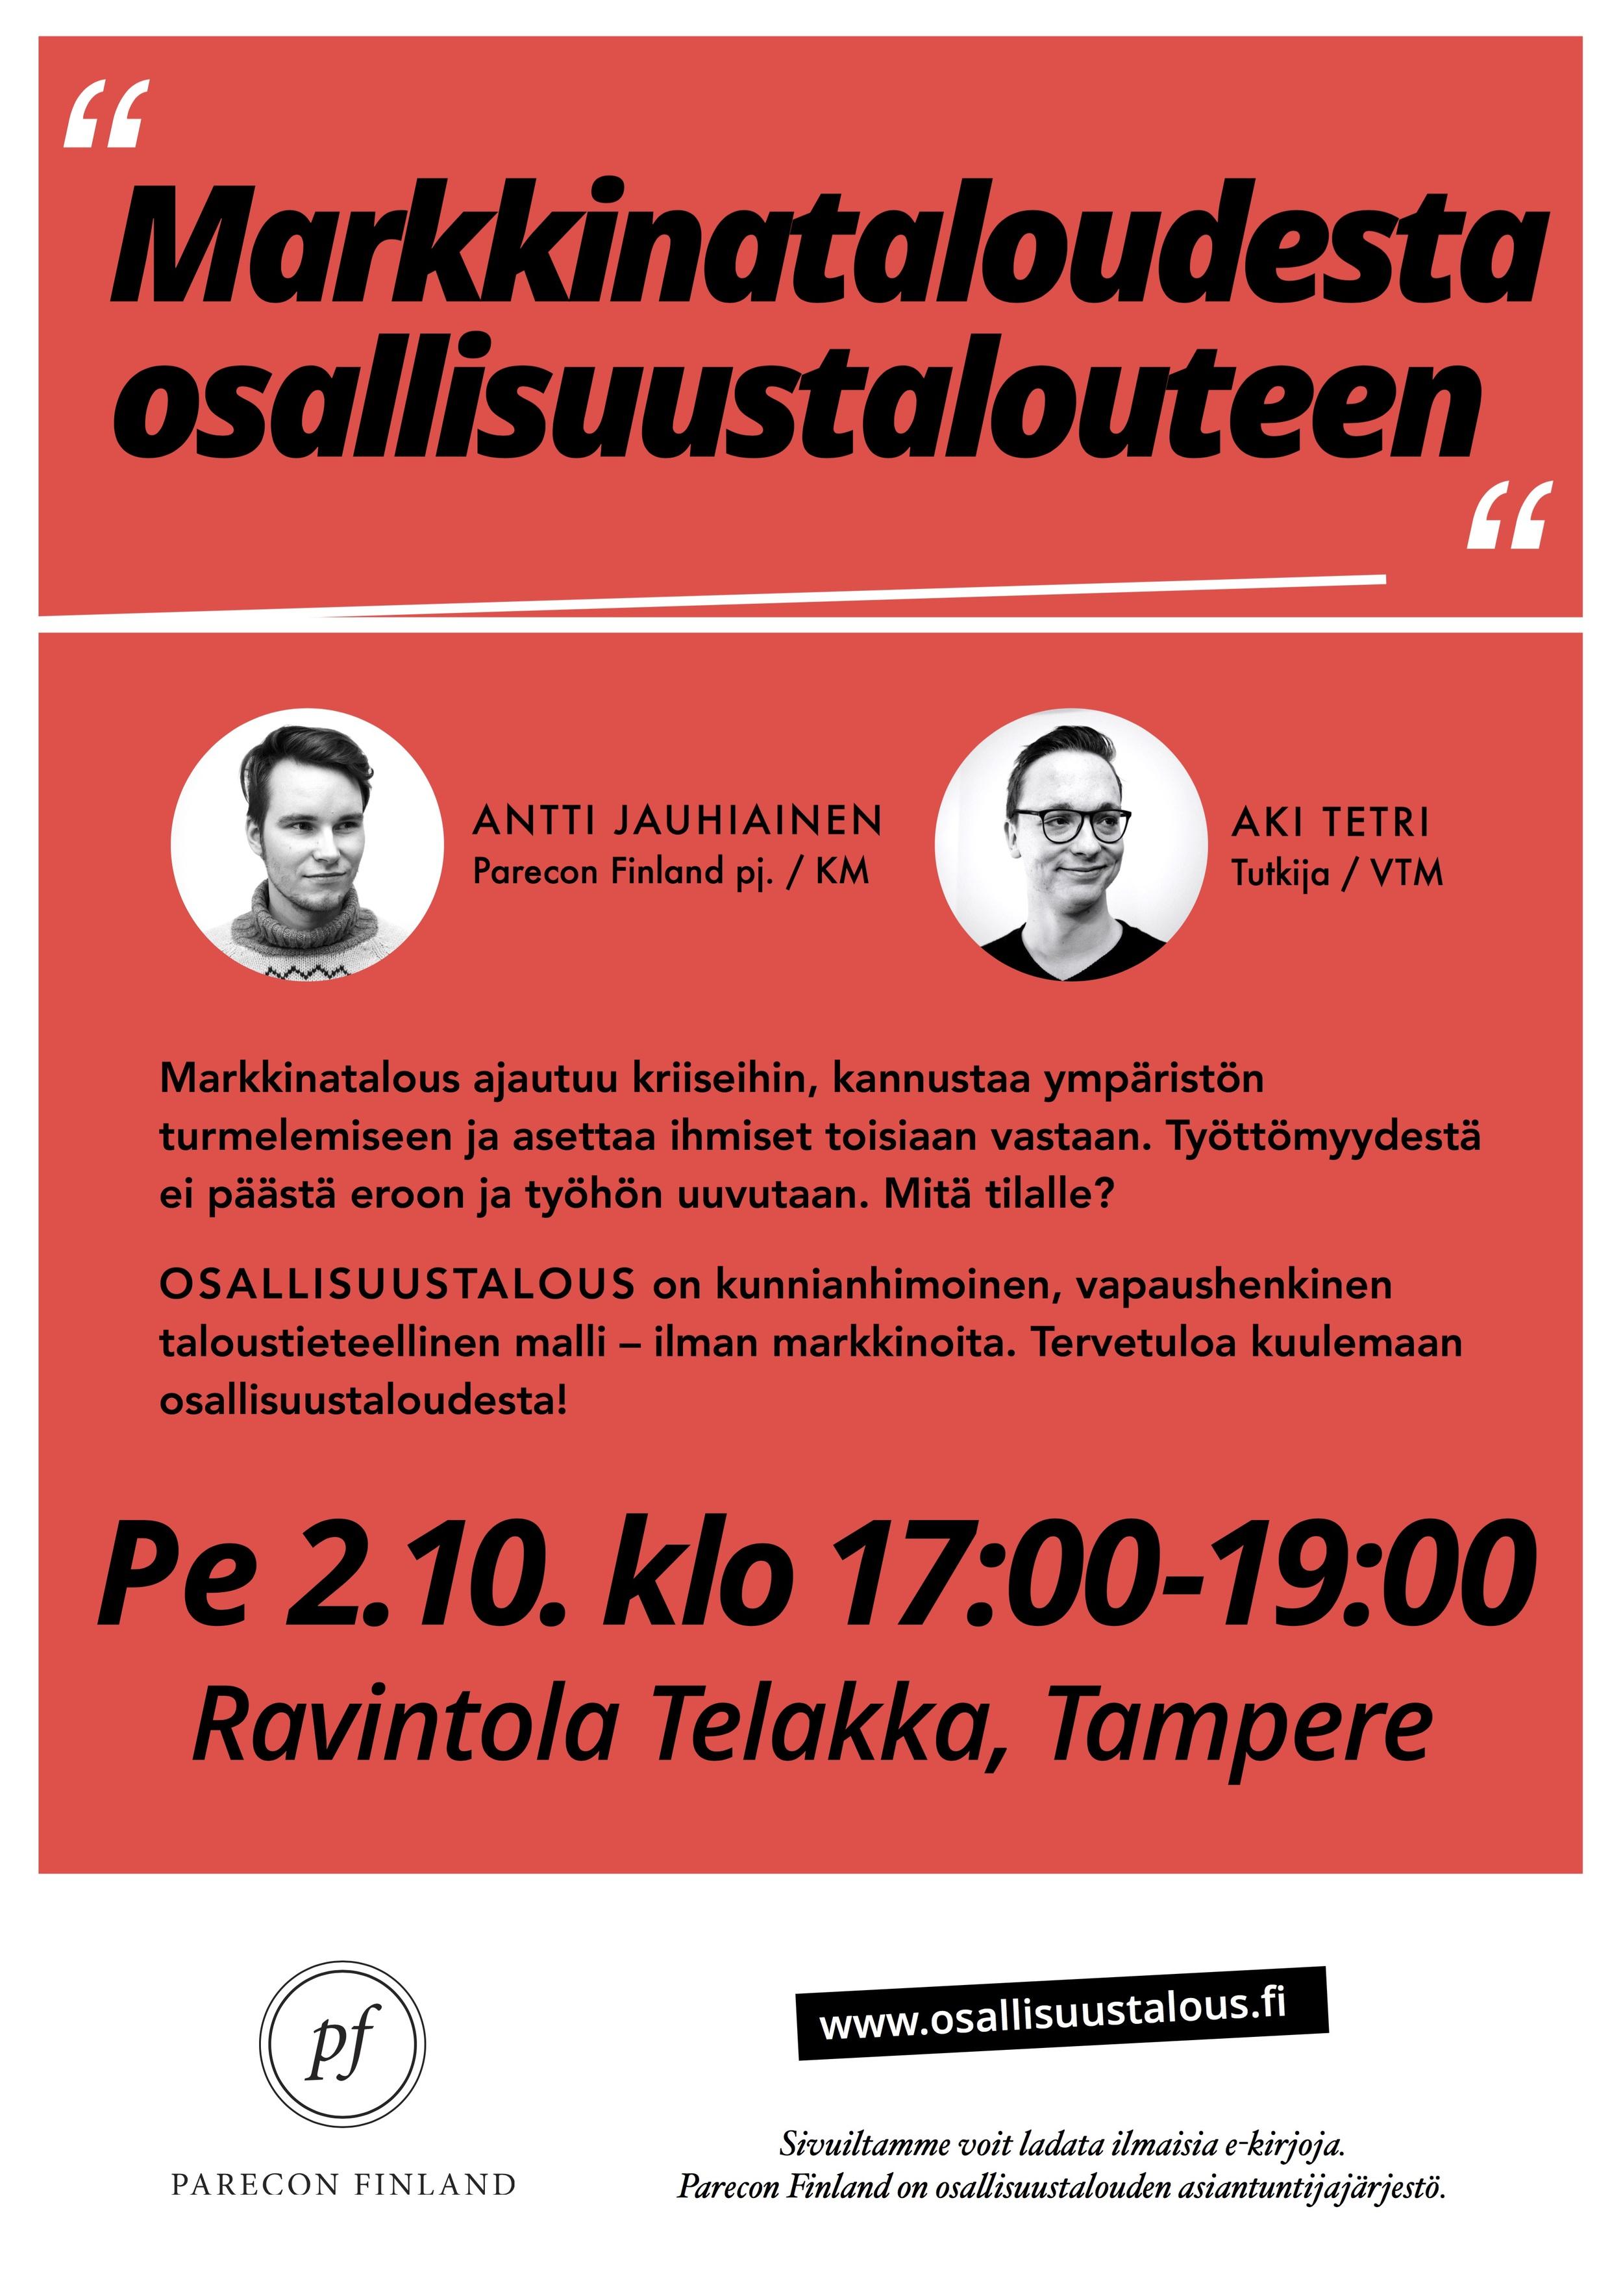 Tampere.jpg